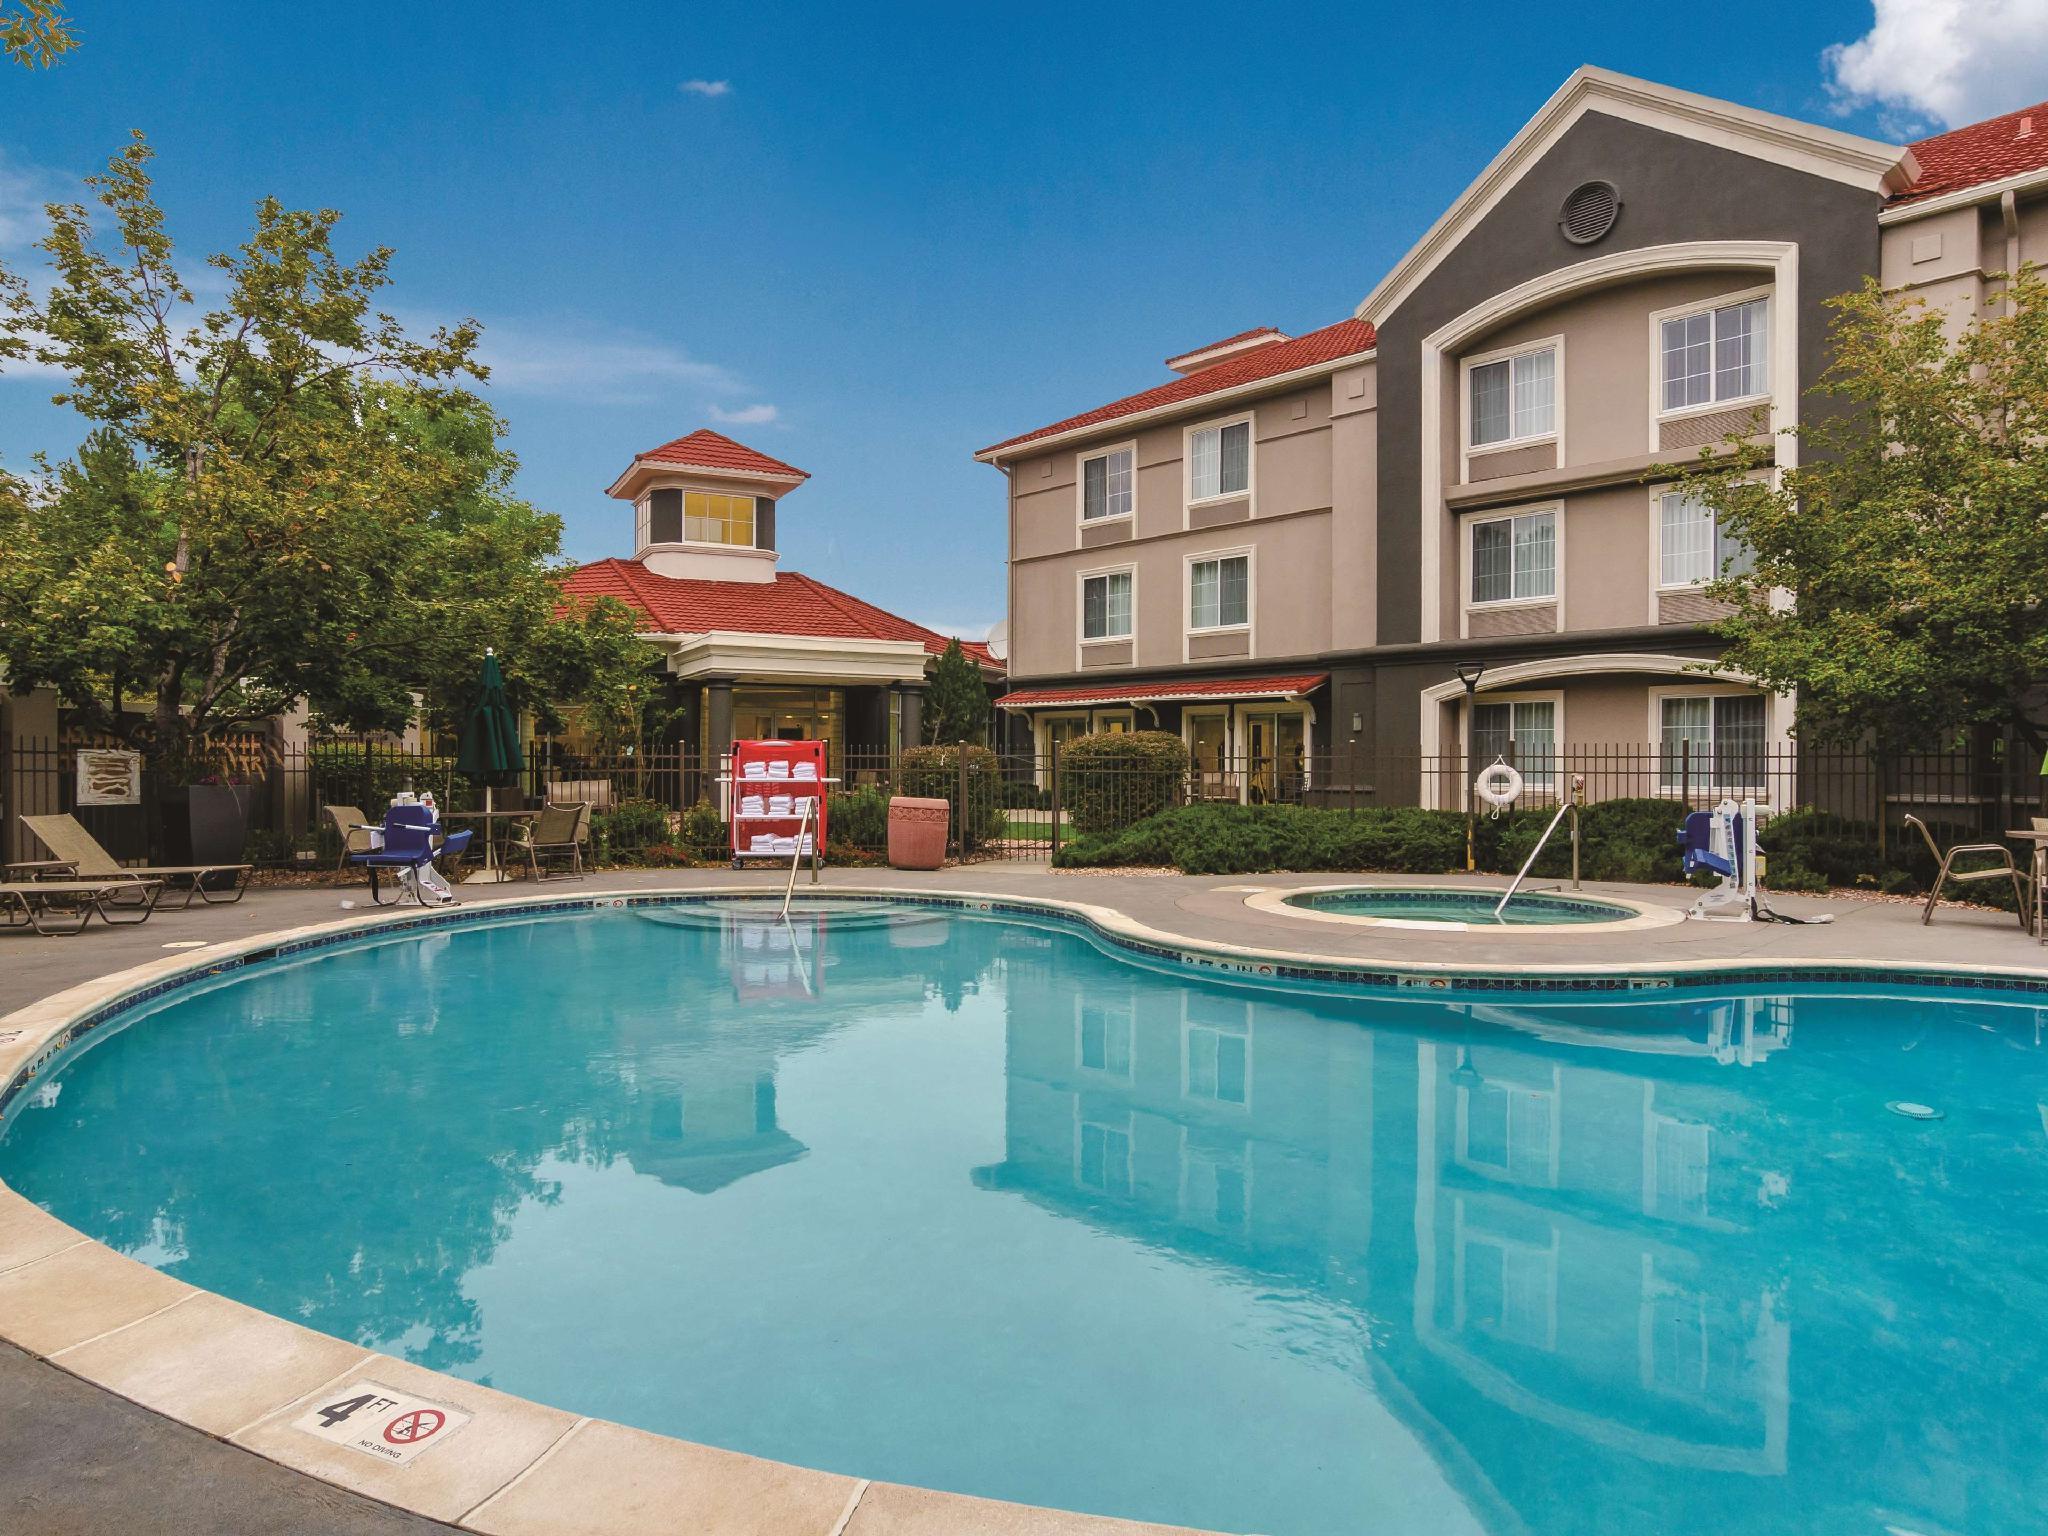 La Quinta Inn And Suites By Wyndham Denver Boulder Louisville